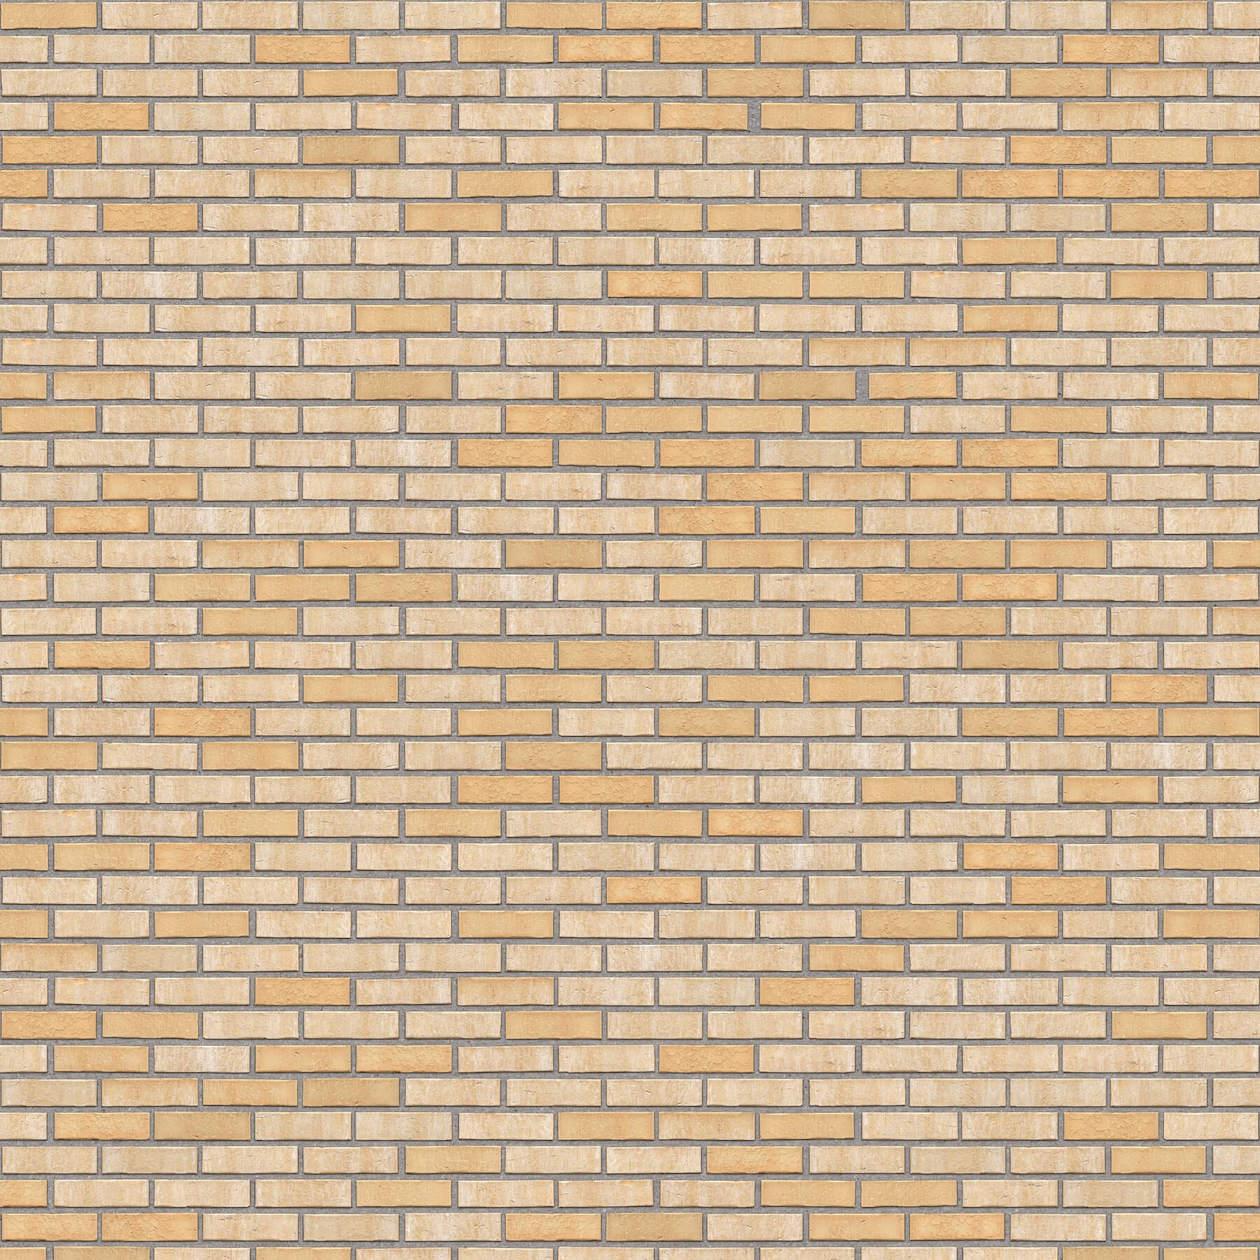 Puna-cigla-FeldHaus-Klinker-brick-house-nf-k-741-Siva Fuga